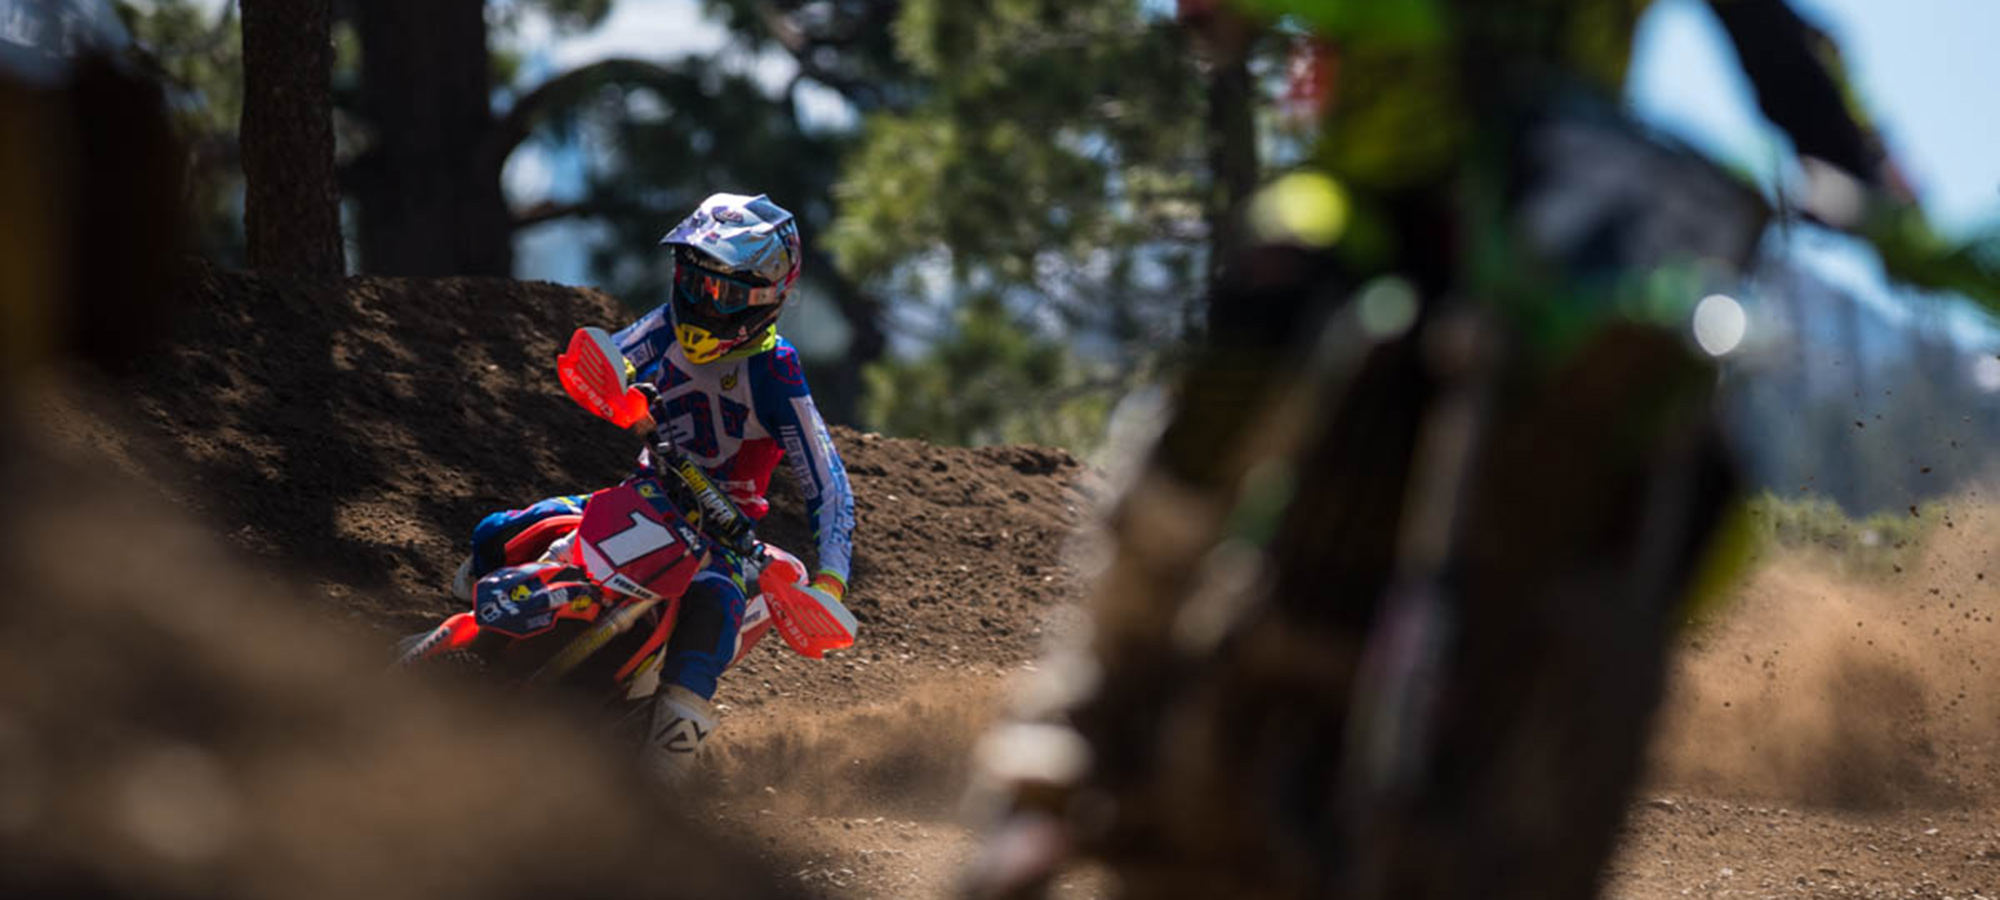 Mammoth Motocross 2017